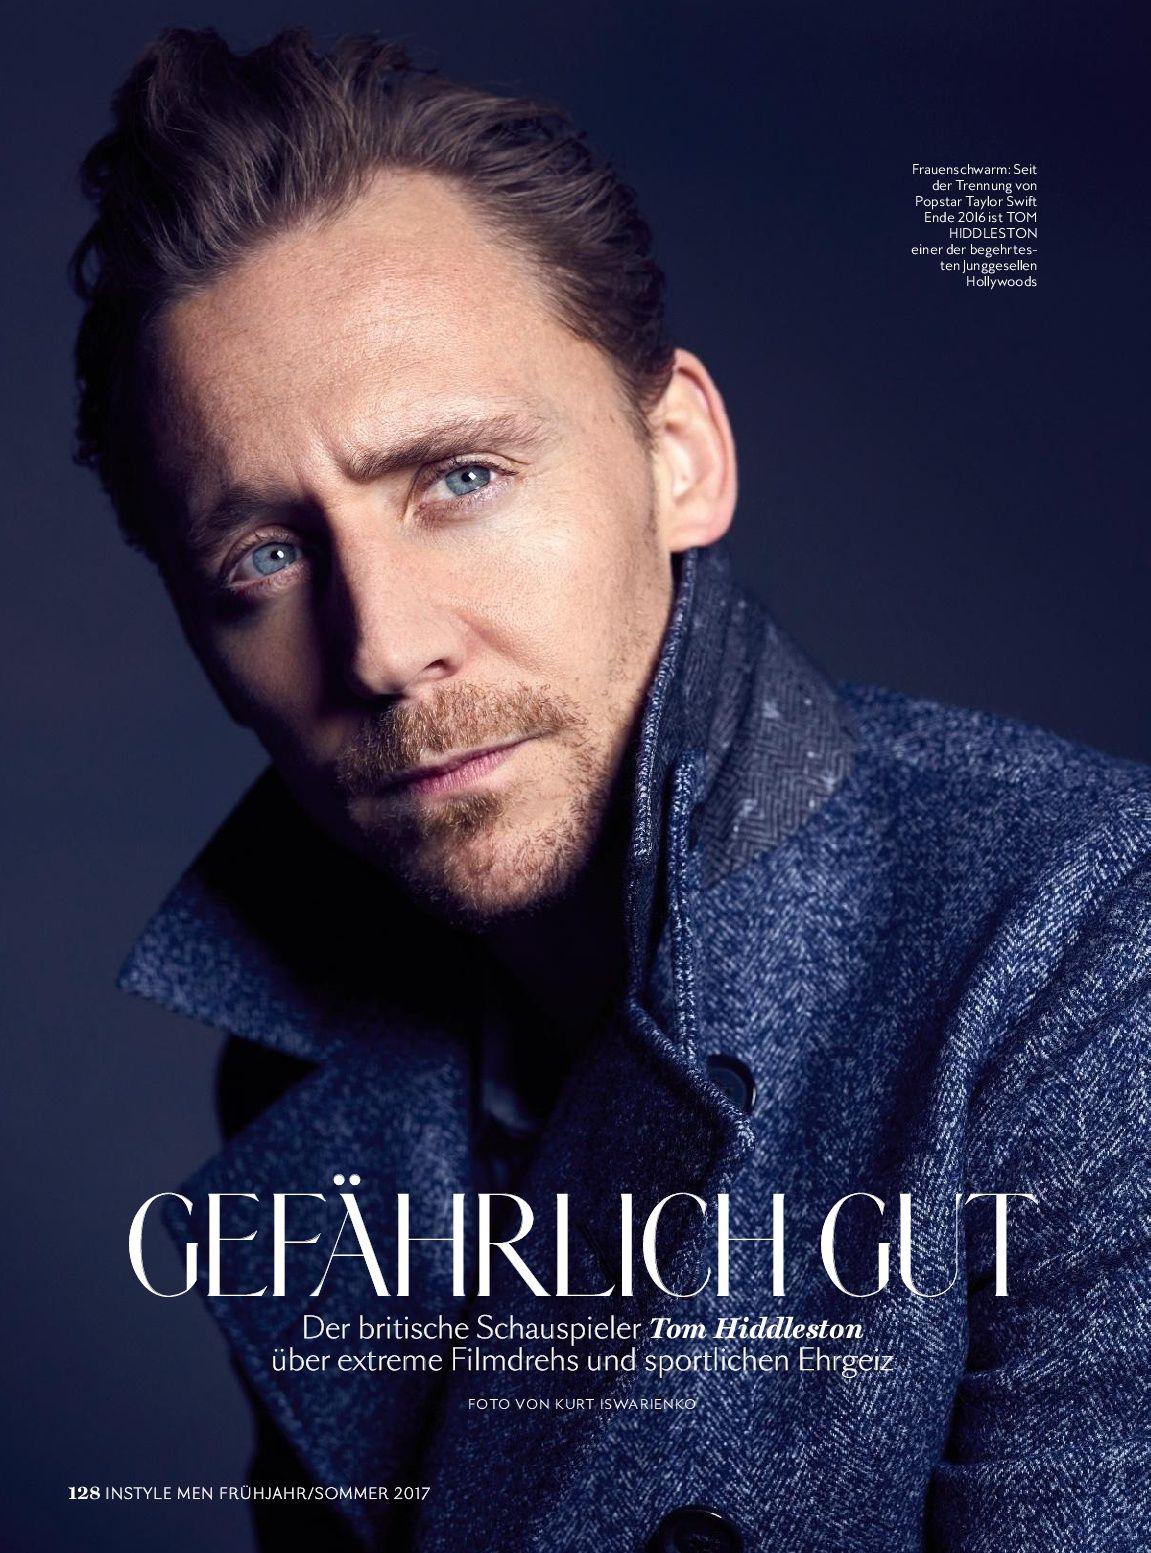 InStyle Men (April 2017) - 001 - Photo Gallery · Tom Hiddleston Fans | Tom Hiddleston Fans ∙ Your fan source for everything Tom Hiddleston